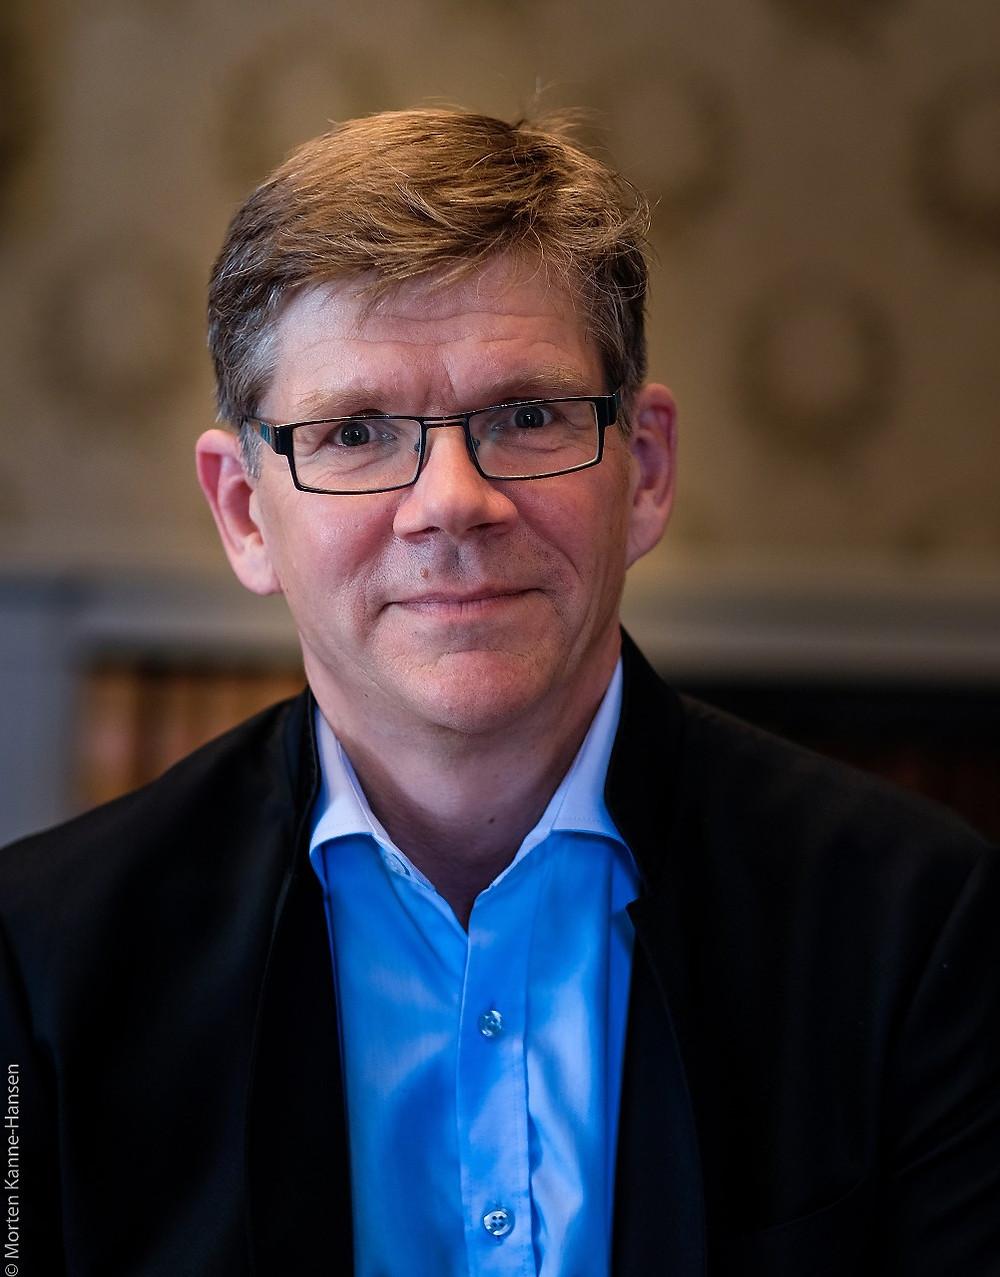 Rektor ved Universitetet i Oslo Svein Stølen